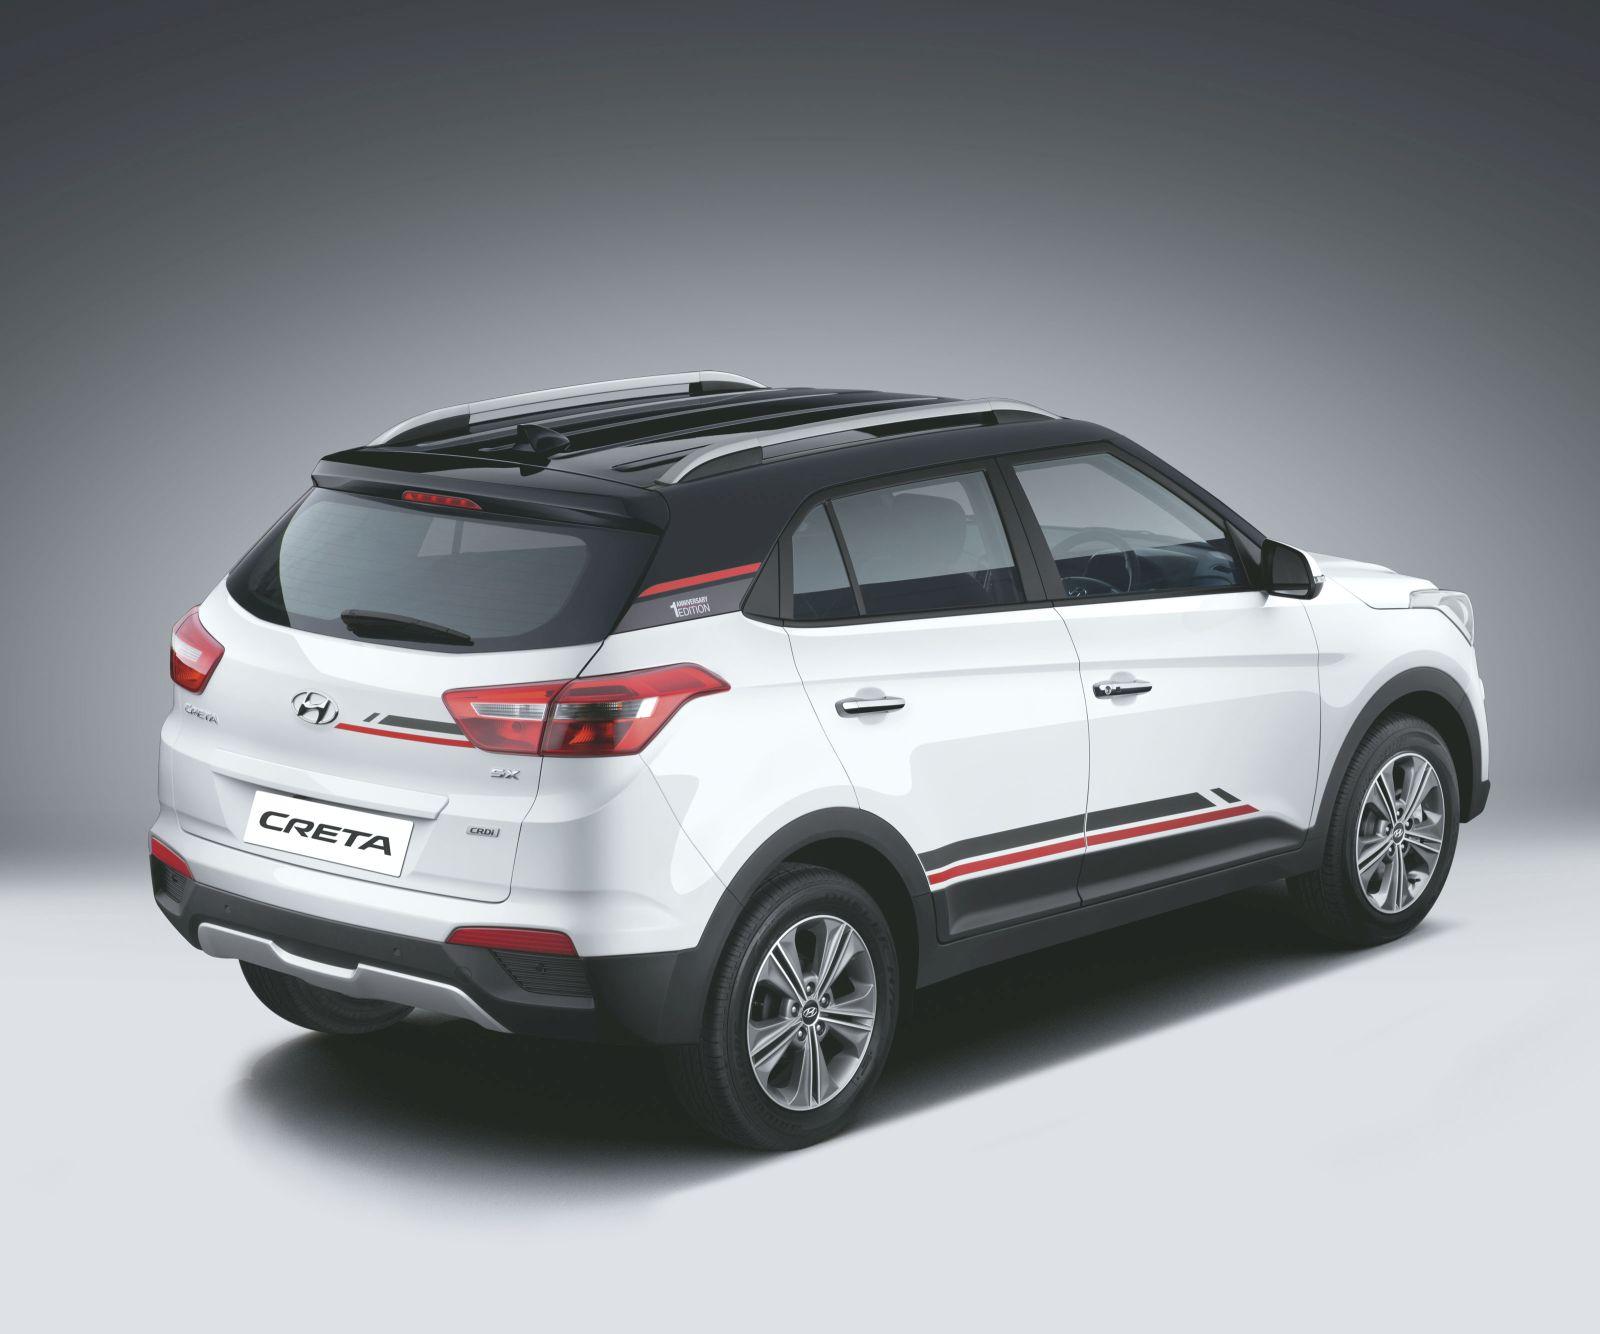 Hyundai Creta special editions (2)